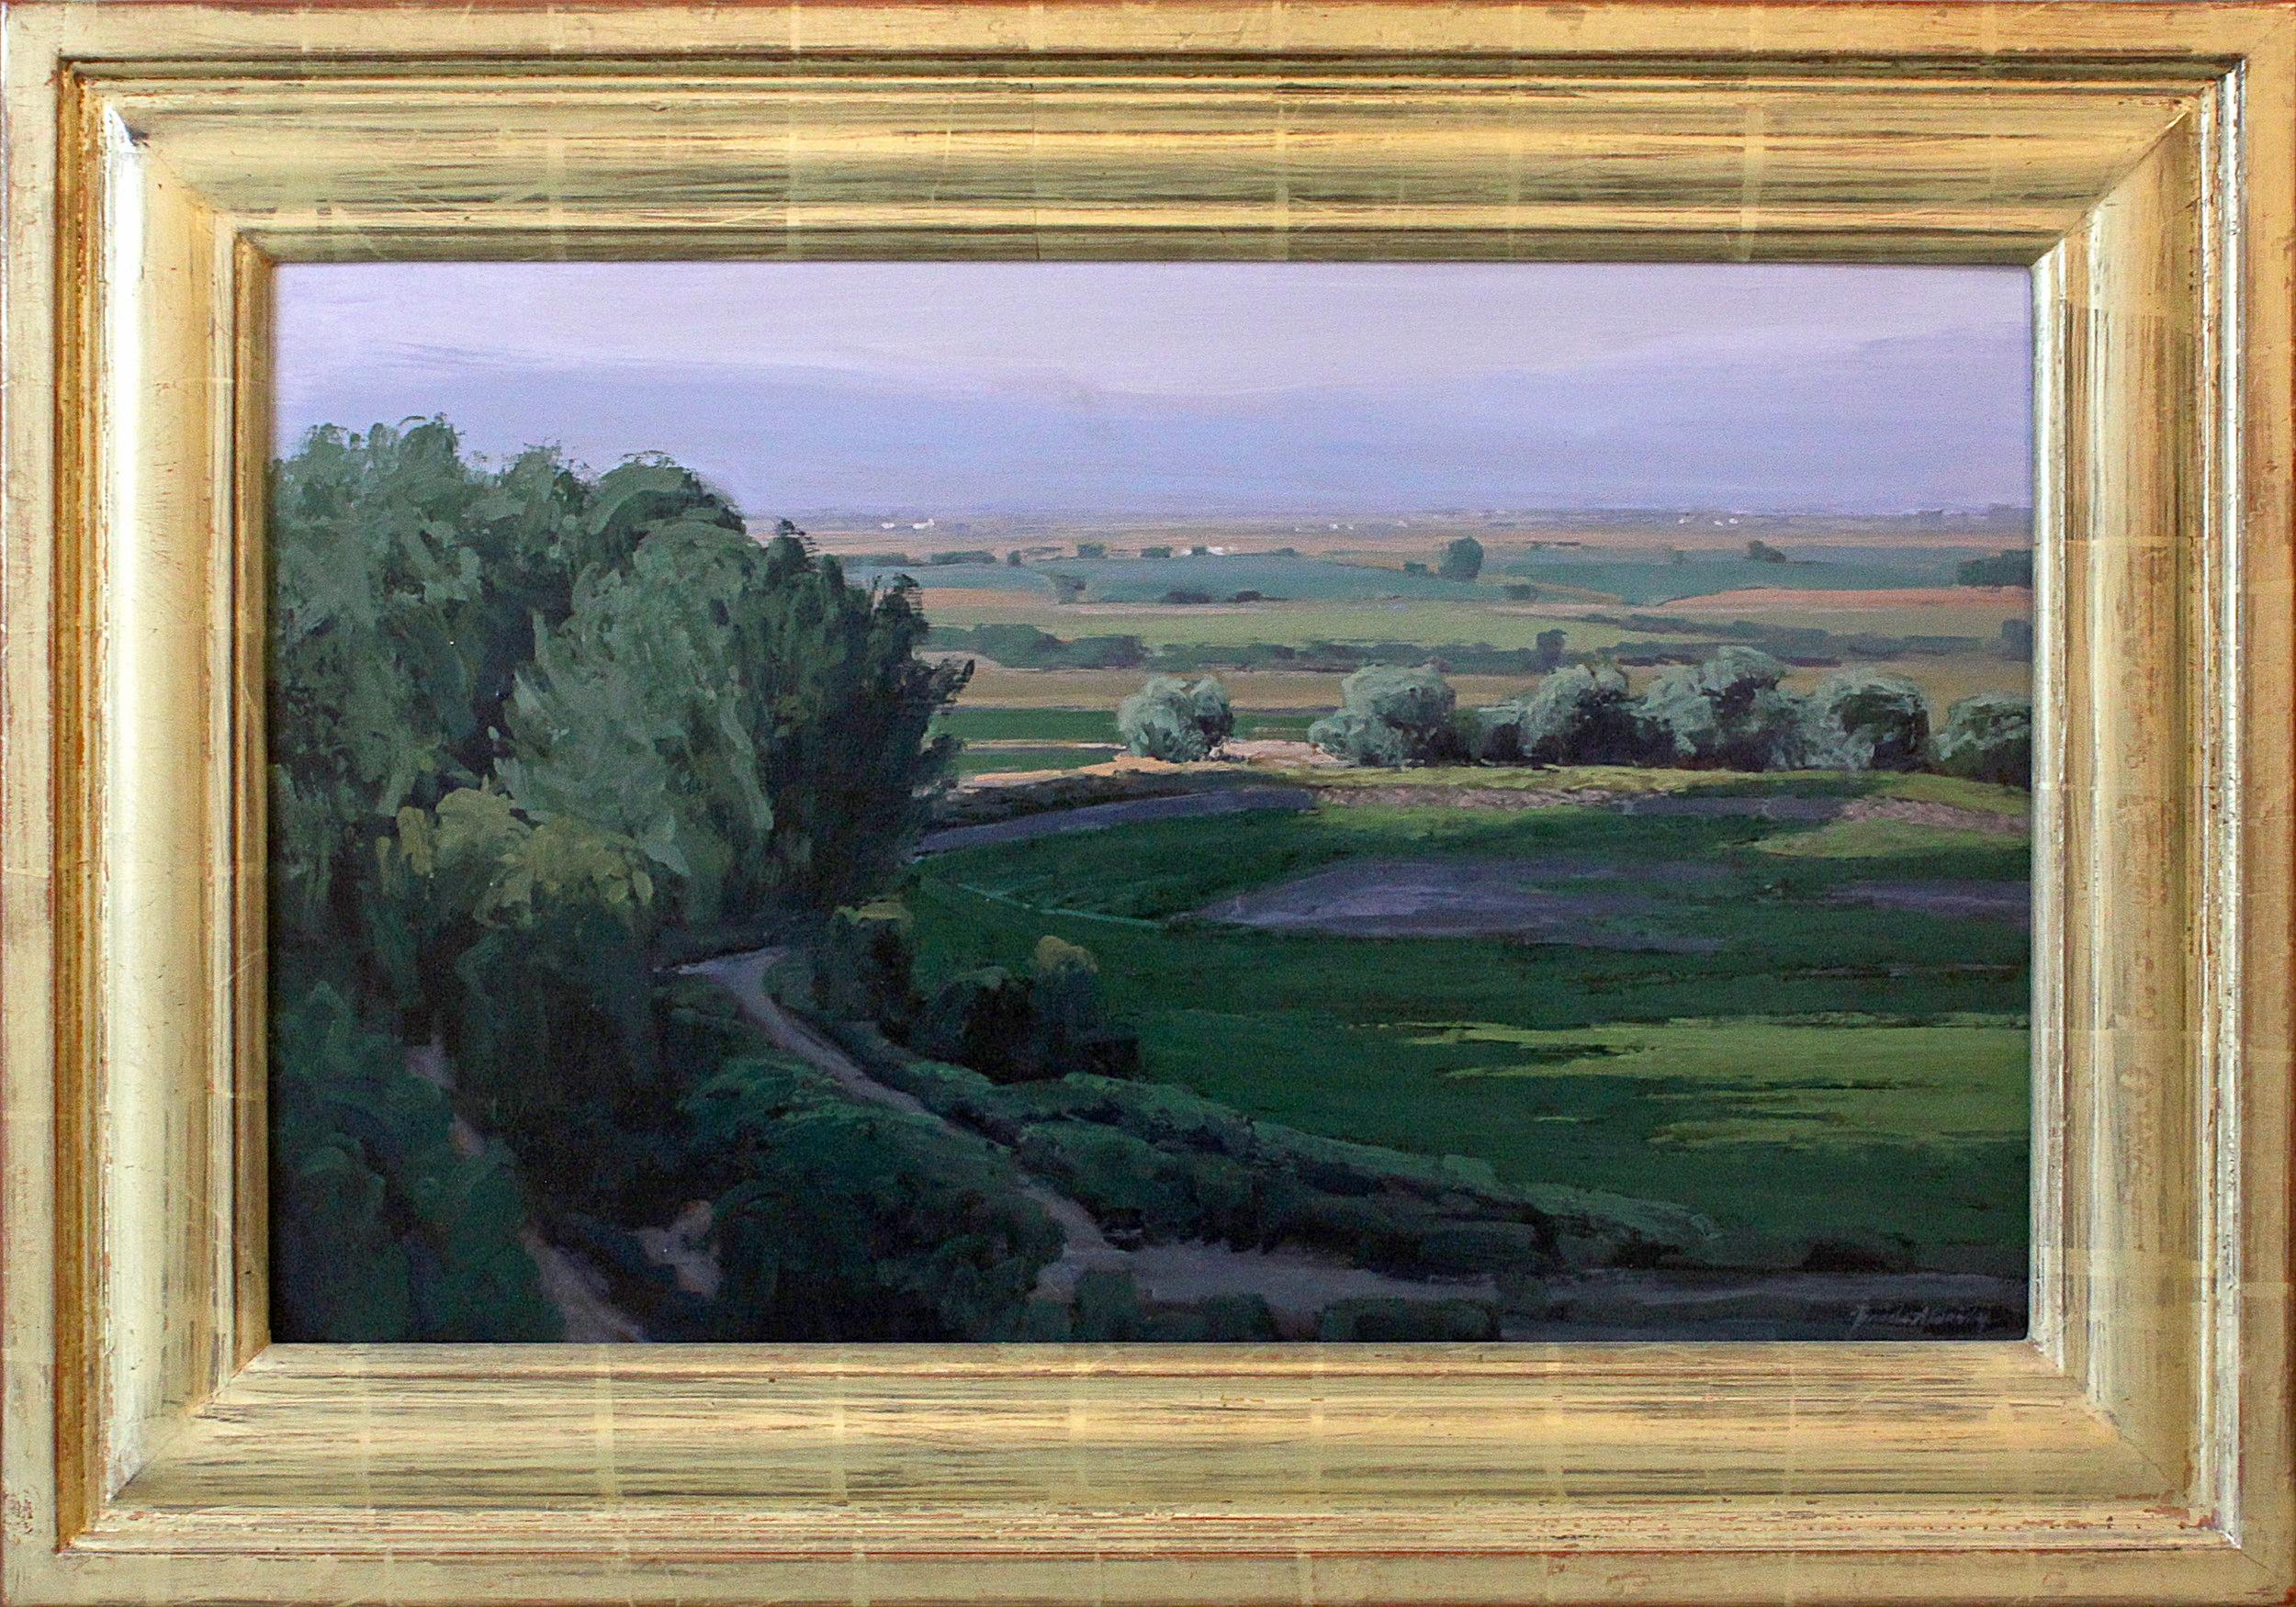 "Dry Pond (Strait's Pond, Spring City, UT) - 24"" x 15"" - oil and acrylic on panel"